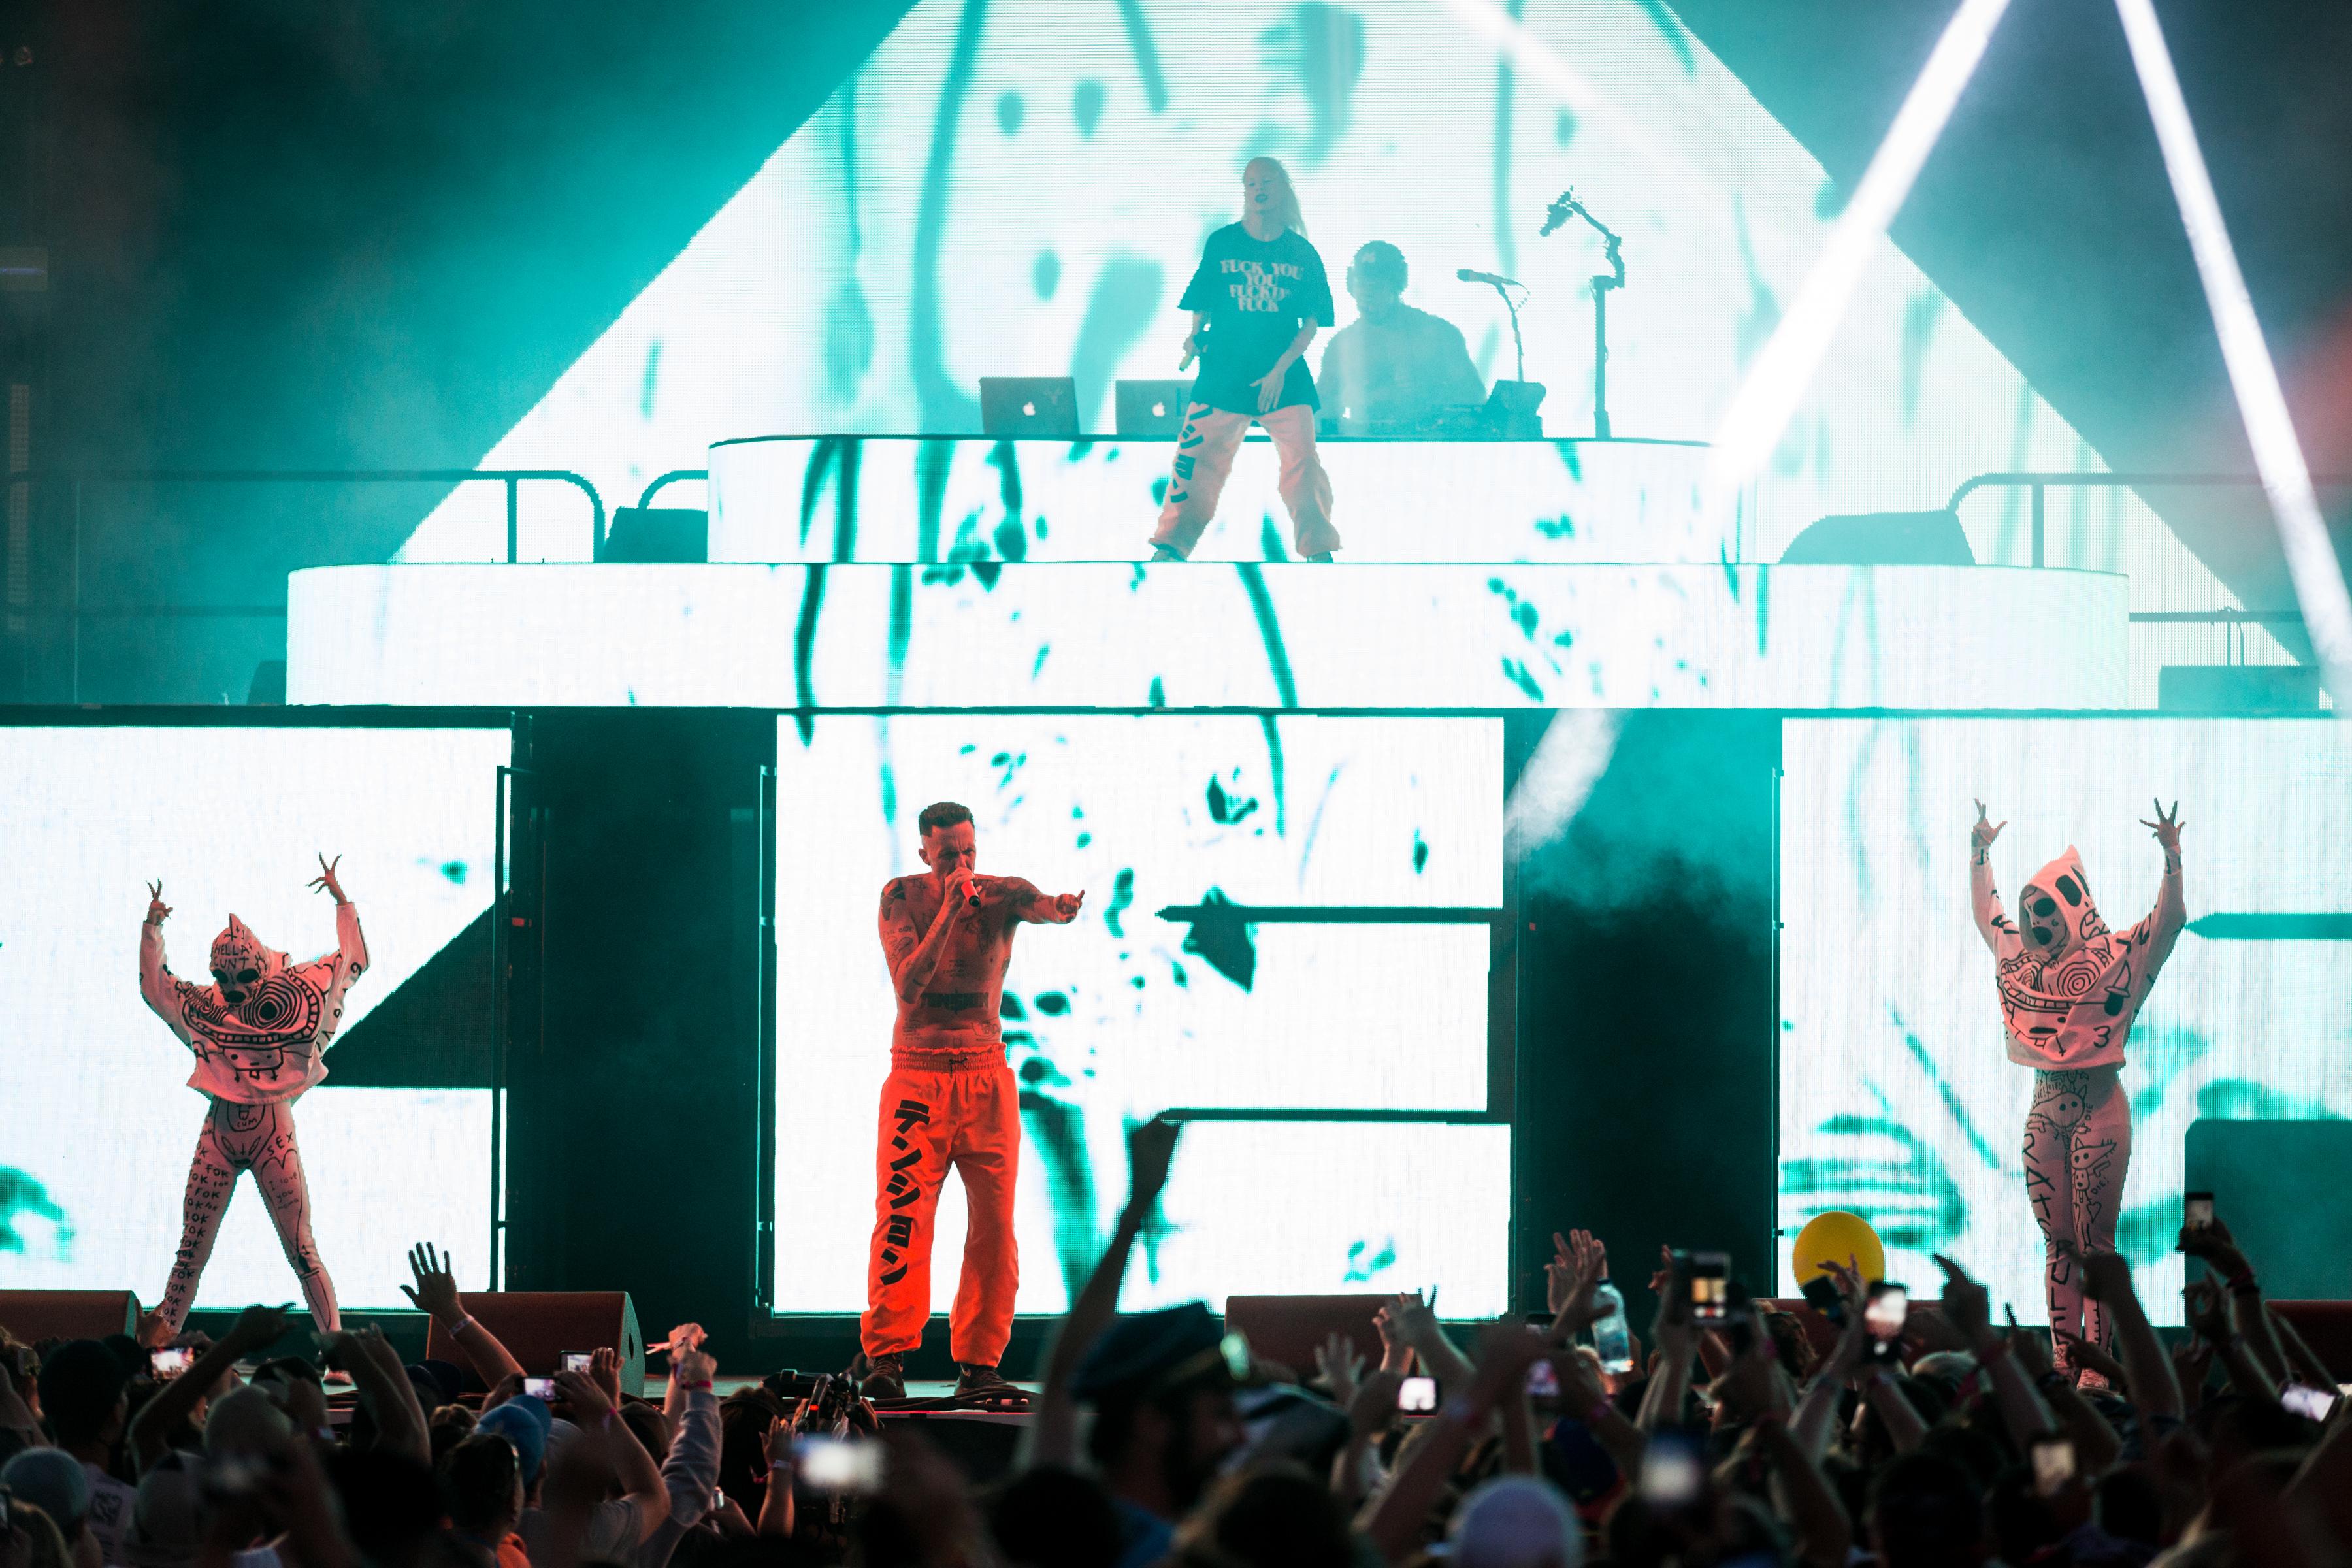 Die Antwoord by Tim Snow / Evenko @ Vans Valley Stage